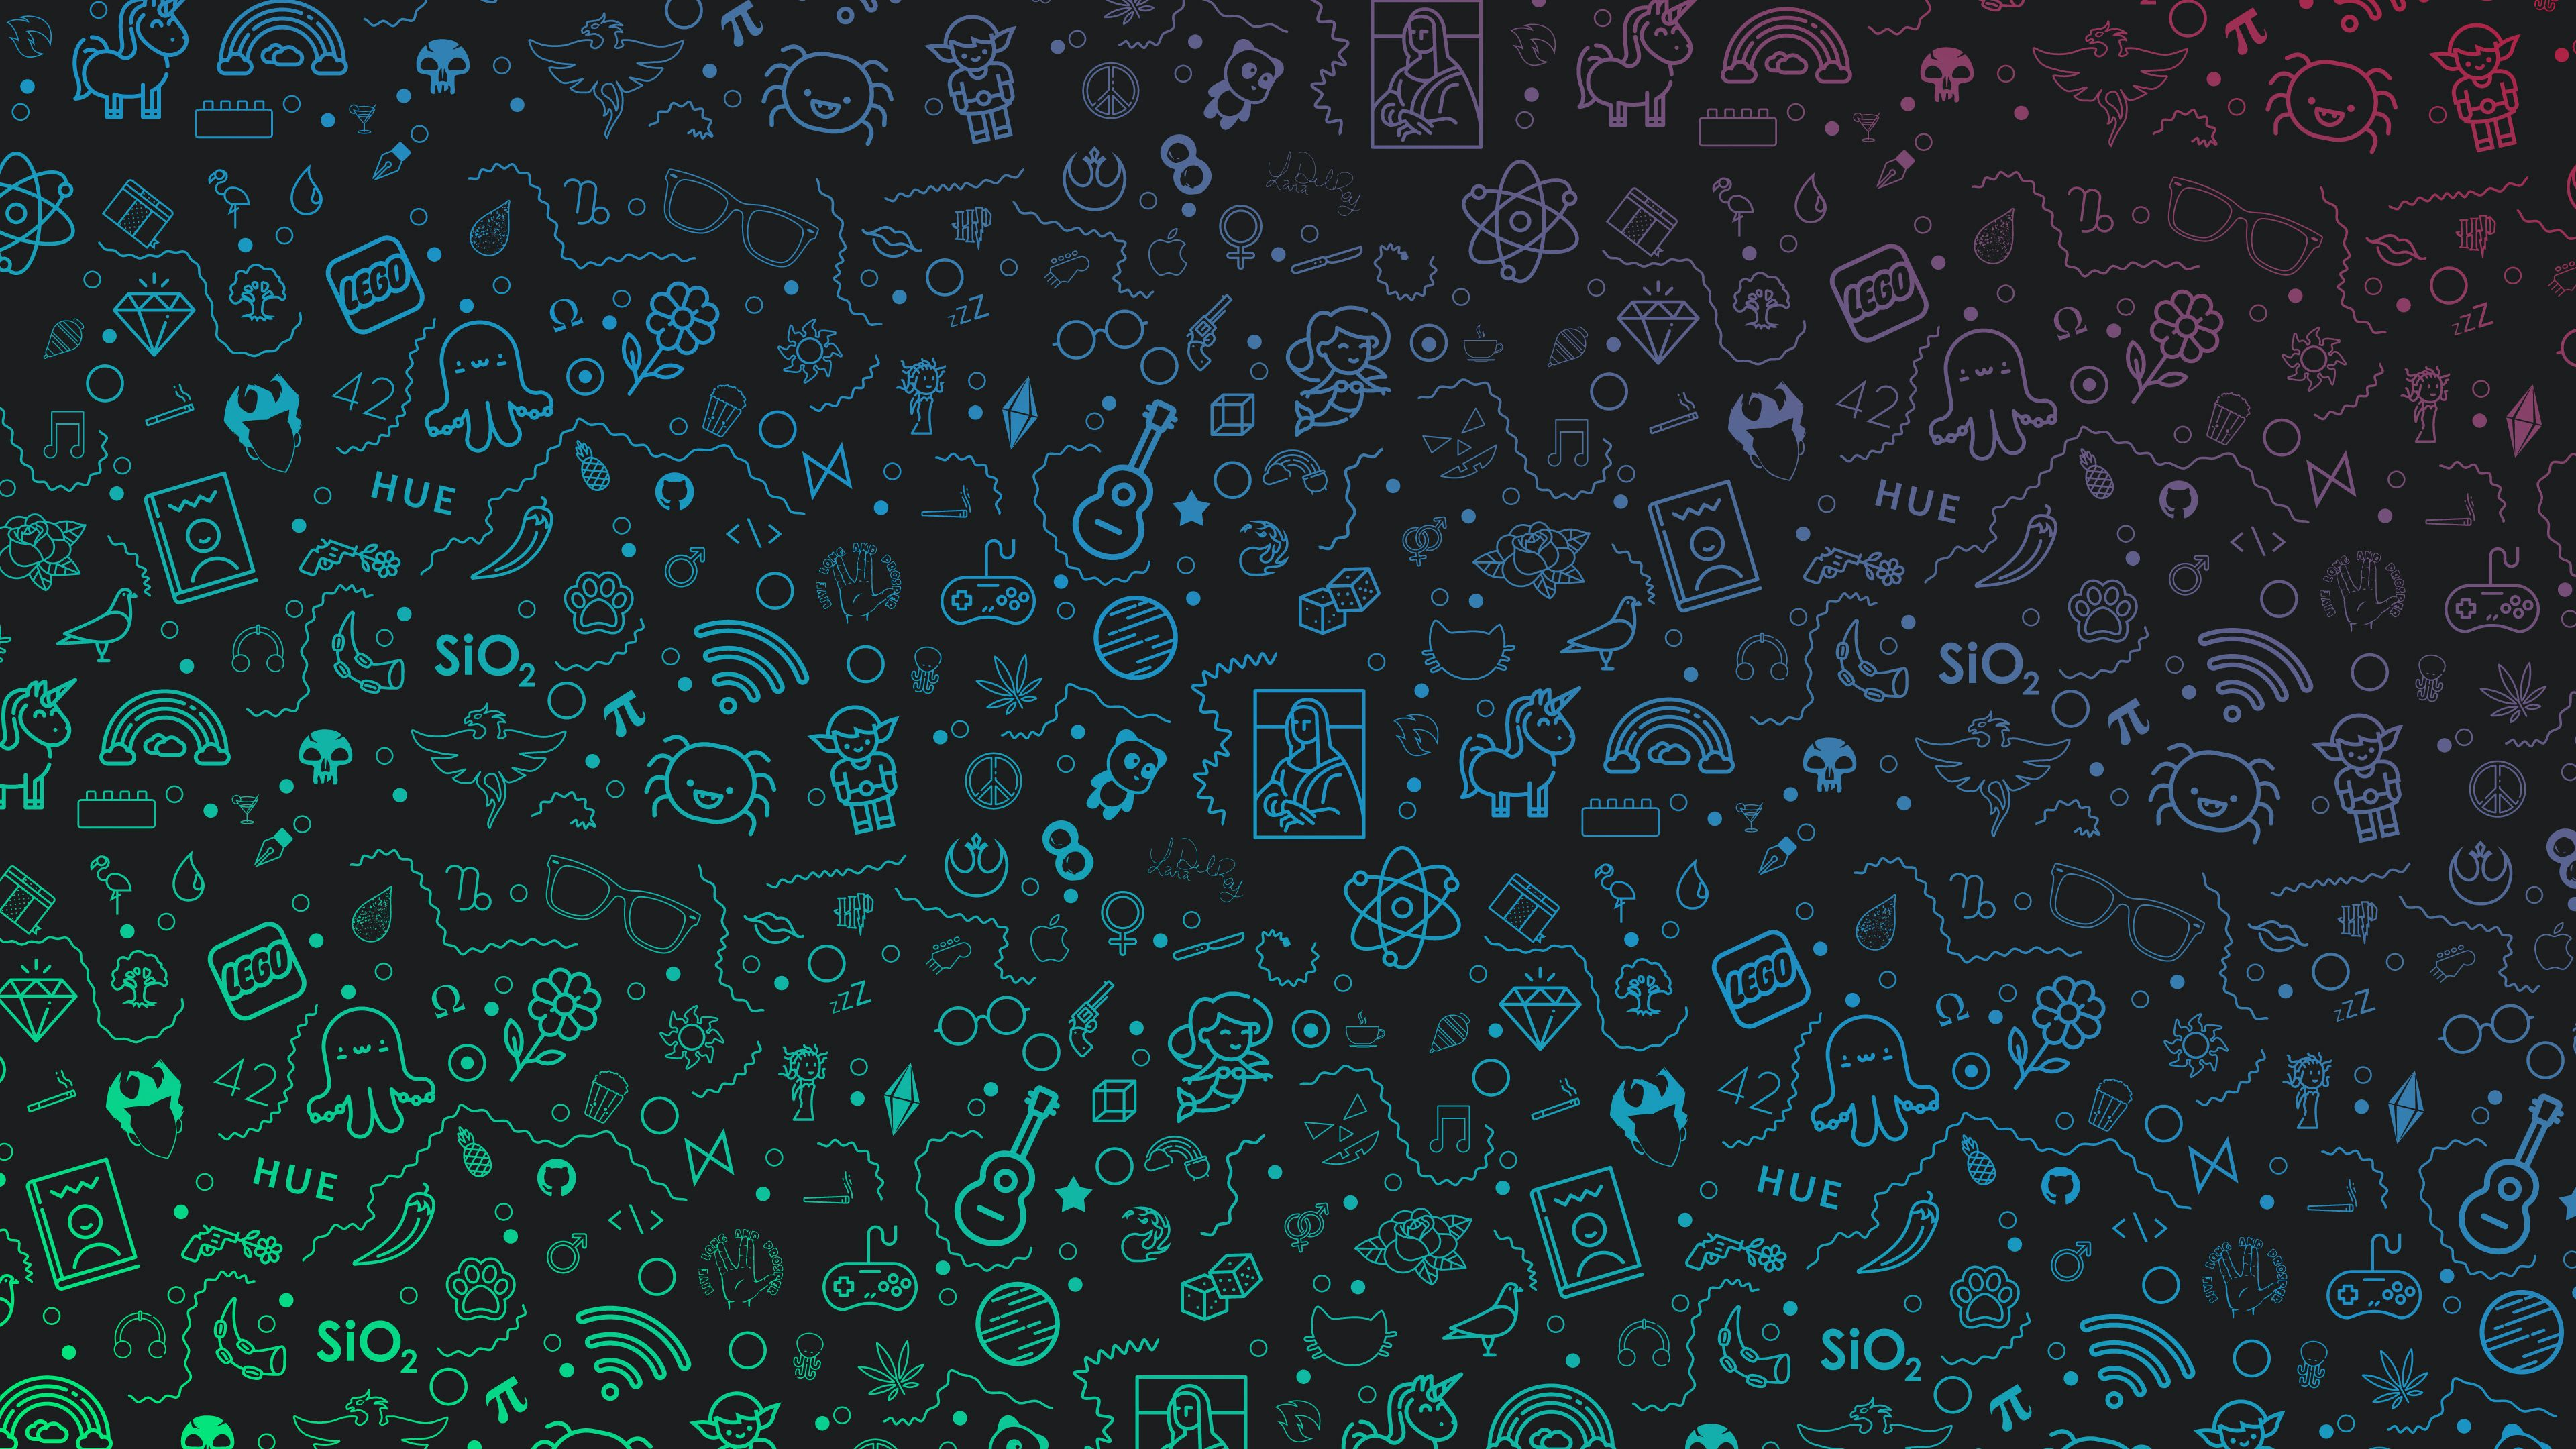 Sketches Gradients Icons Logo 4k Minimalist Wallpapers Minimalism Wallpapers Logo Wallpapers Hd Wallpap In 2020 4k Desktop Wallpapers Desktop Wallpaper Hd Wallpaper